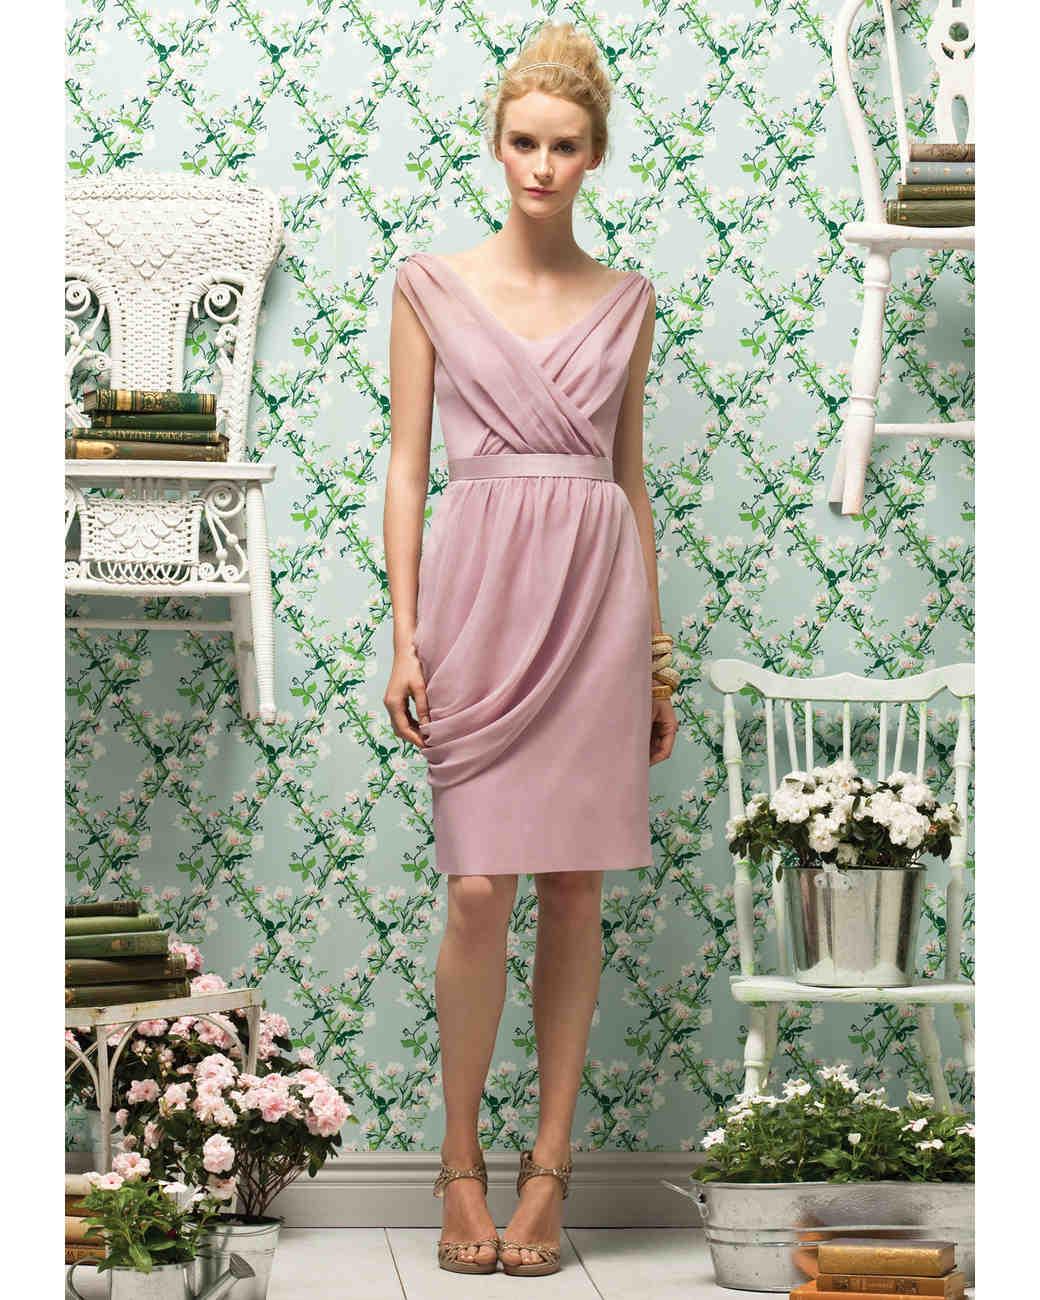 dessy-group-bridal-lela-rose-bridesmaids-dresses-1.jpg